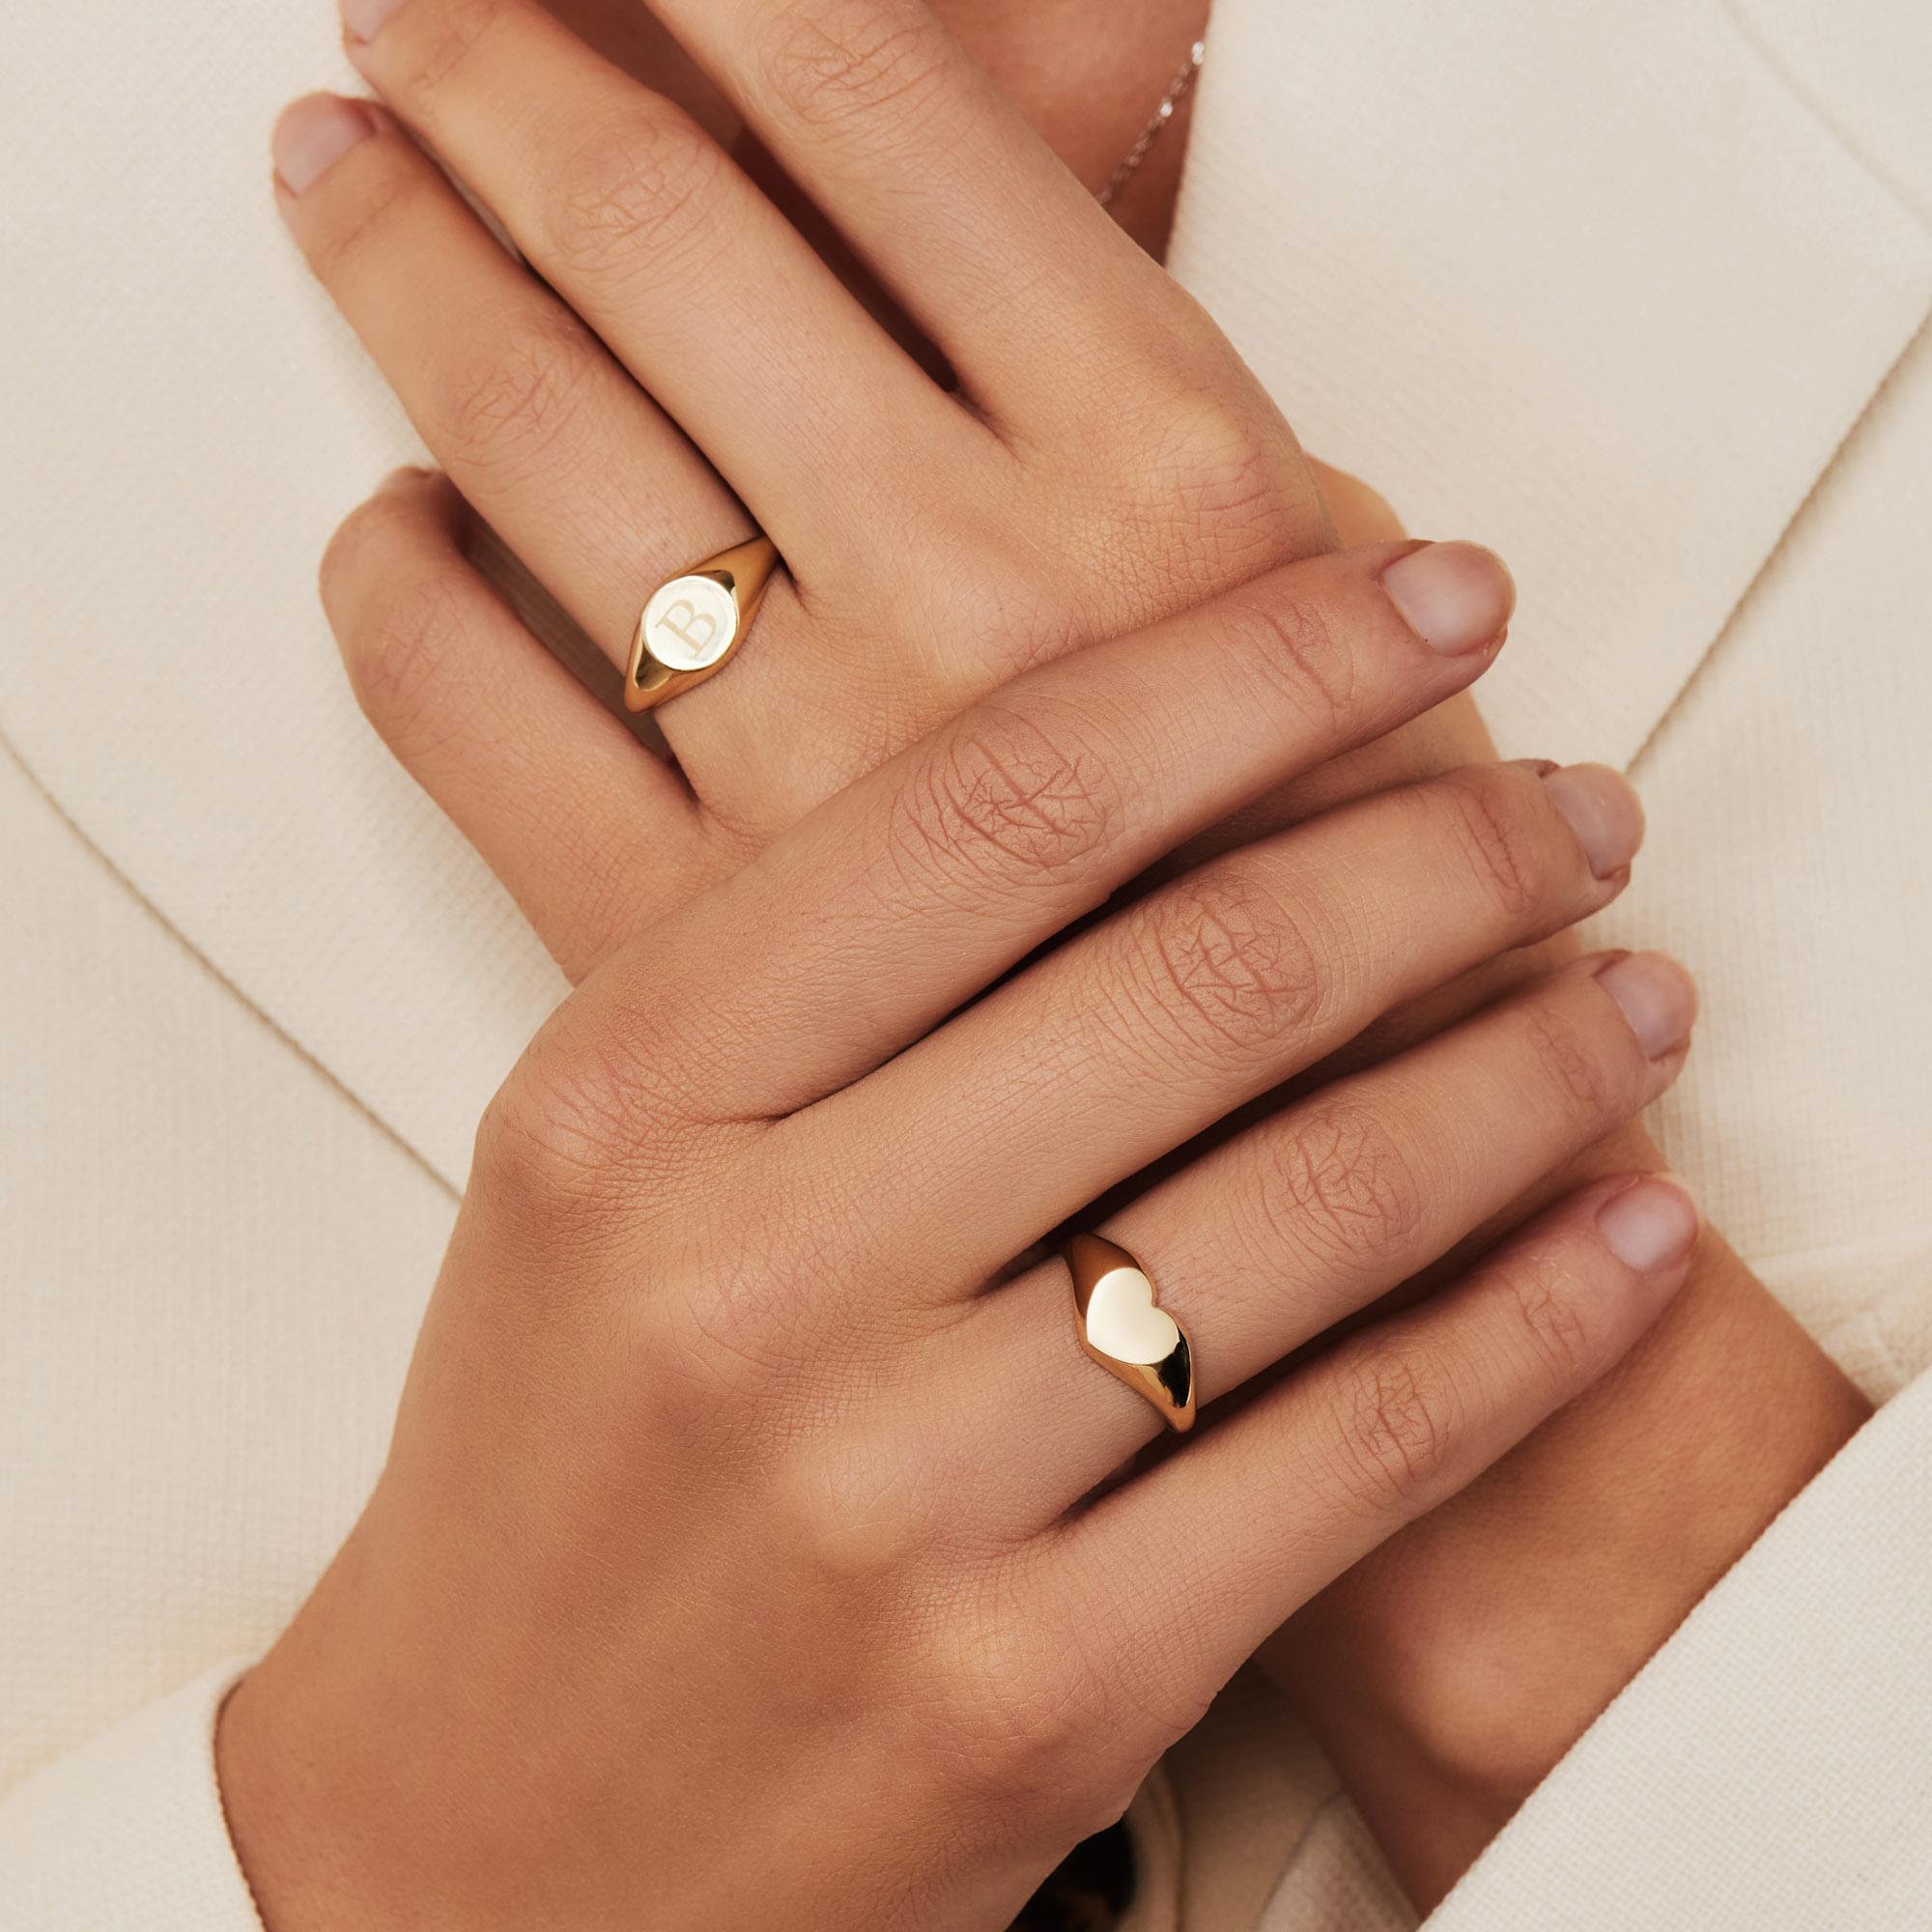 Isabel Bernard Le Marais Lauren 14 karat gold initial signet ring with letter (48)